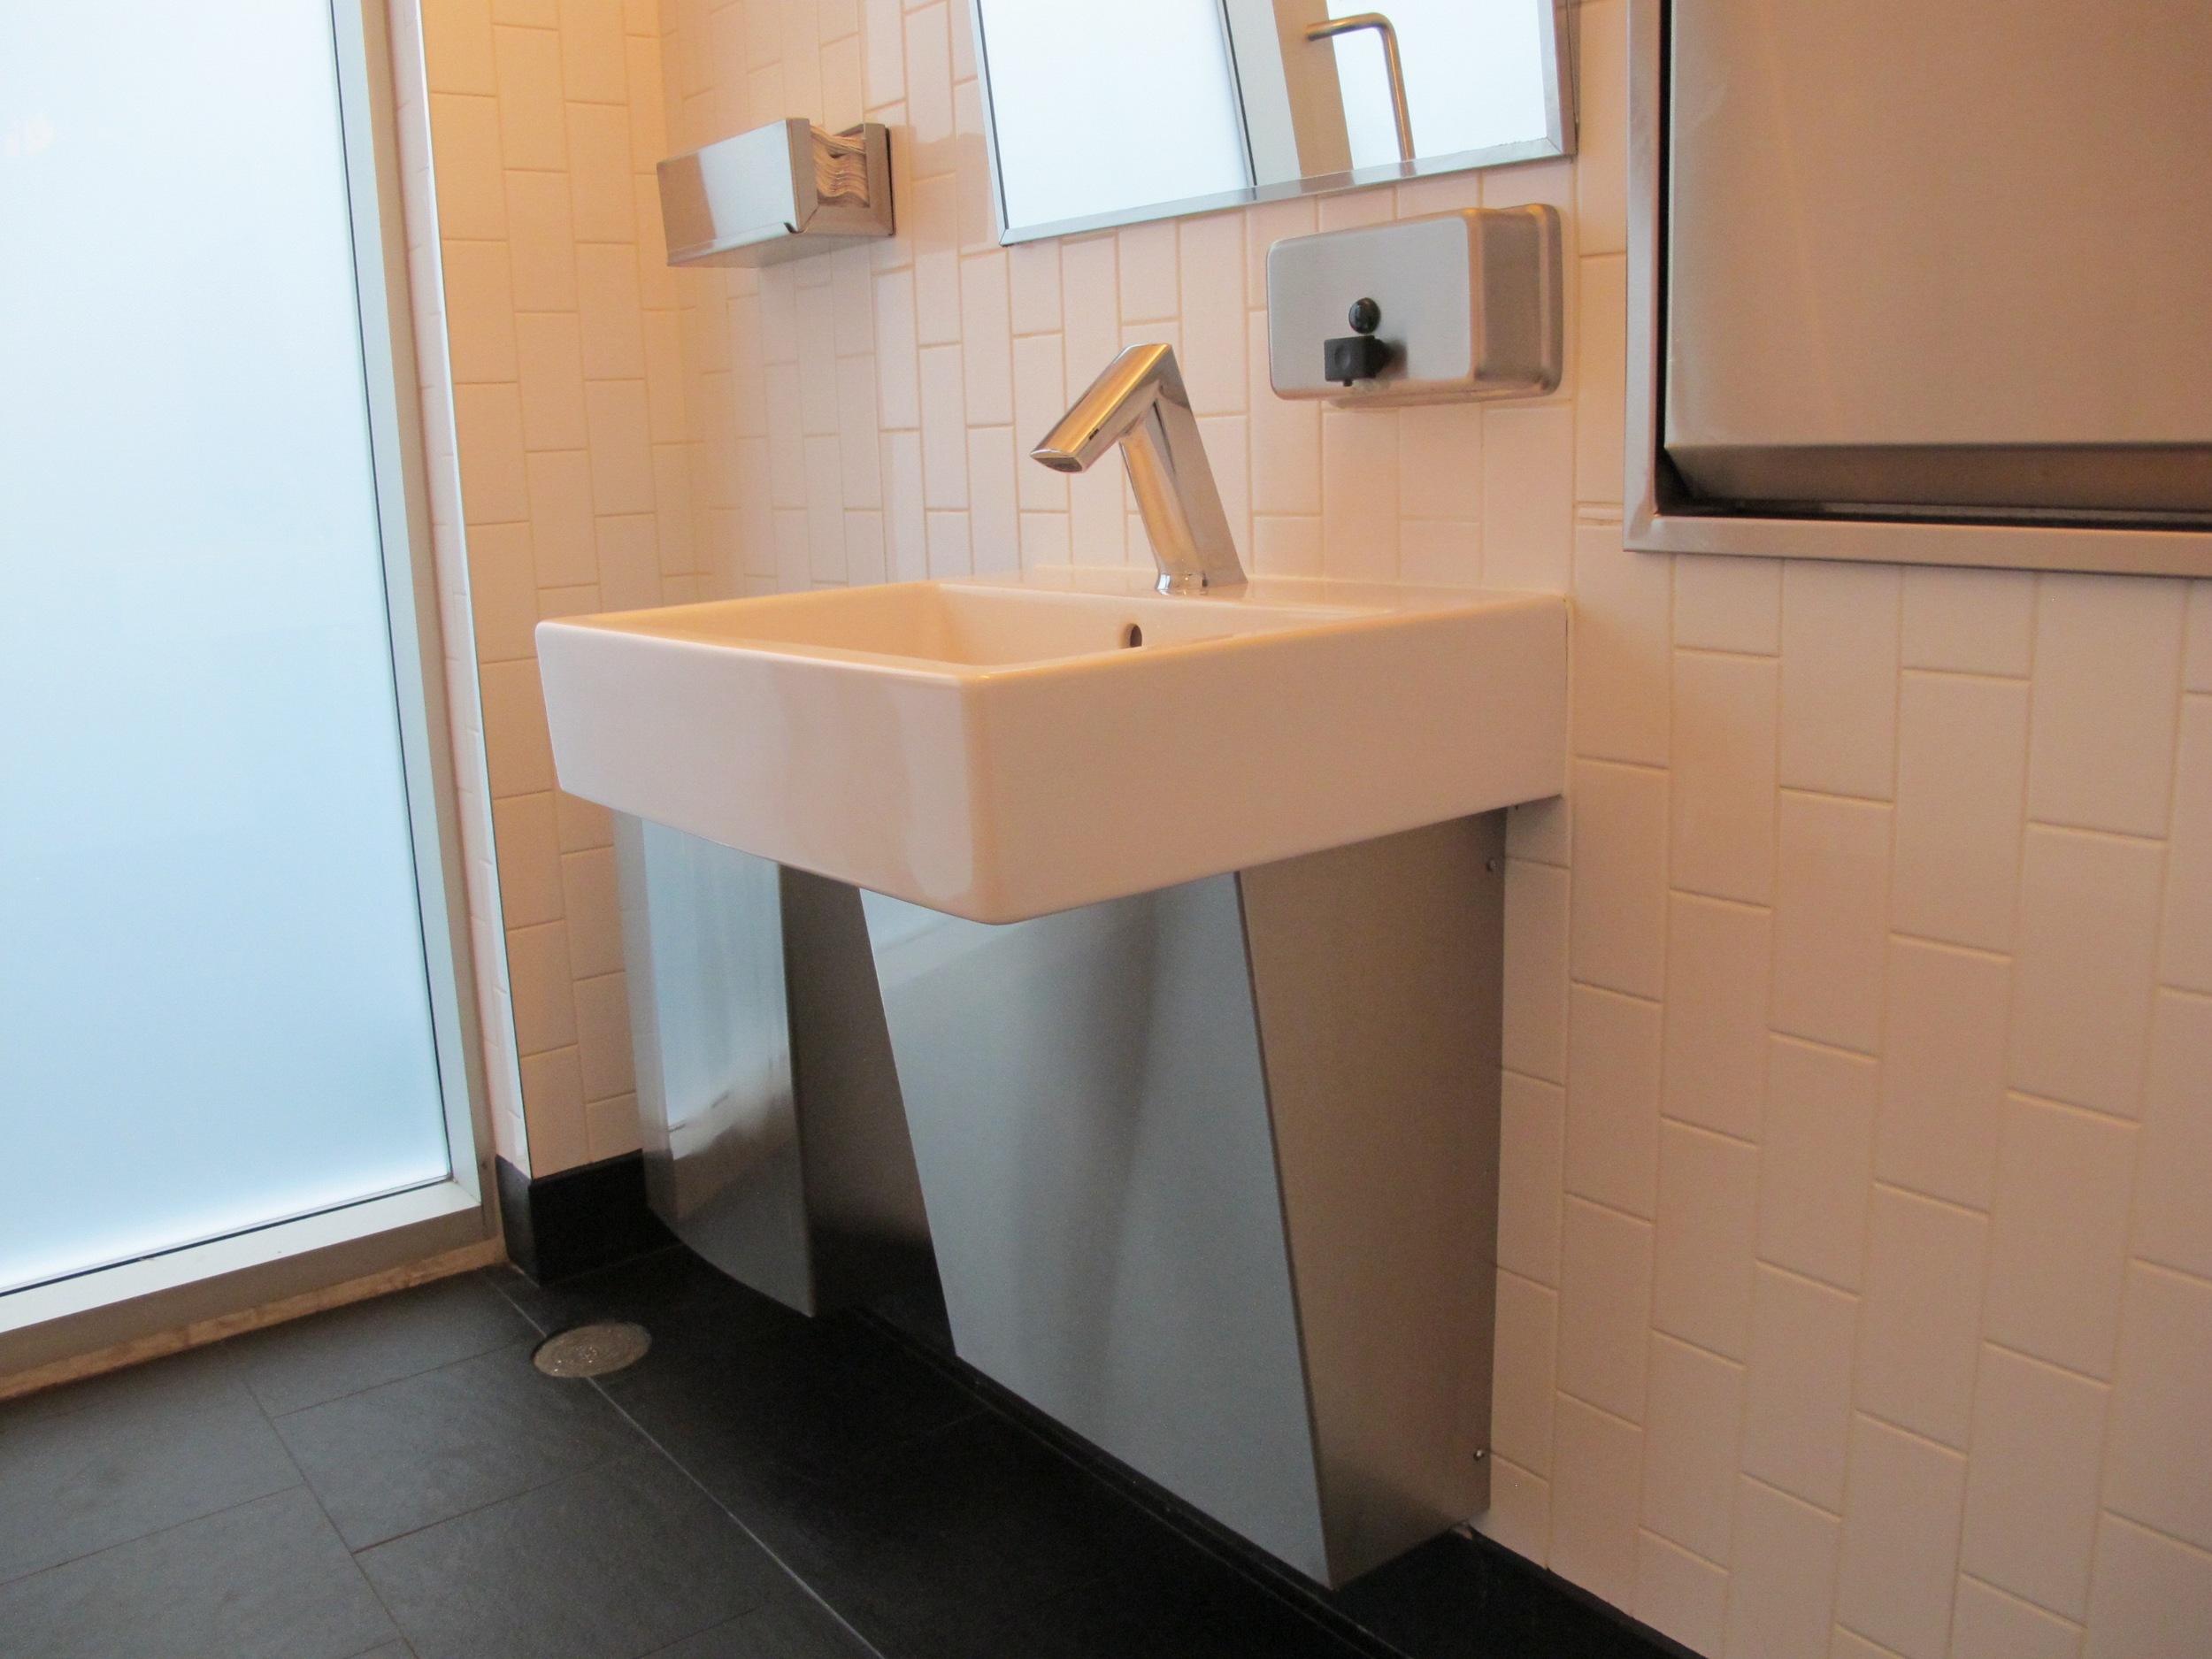 Picture of washroom sink